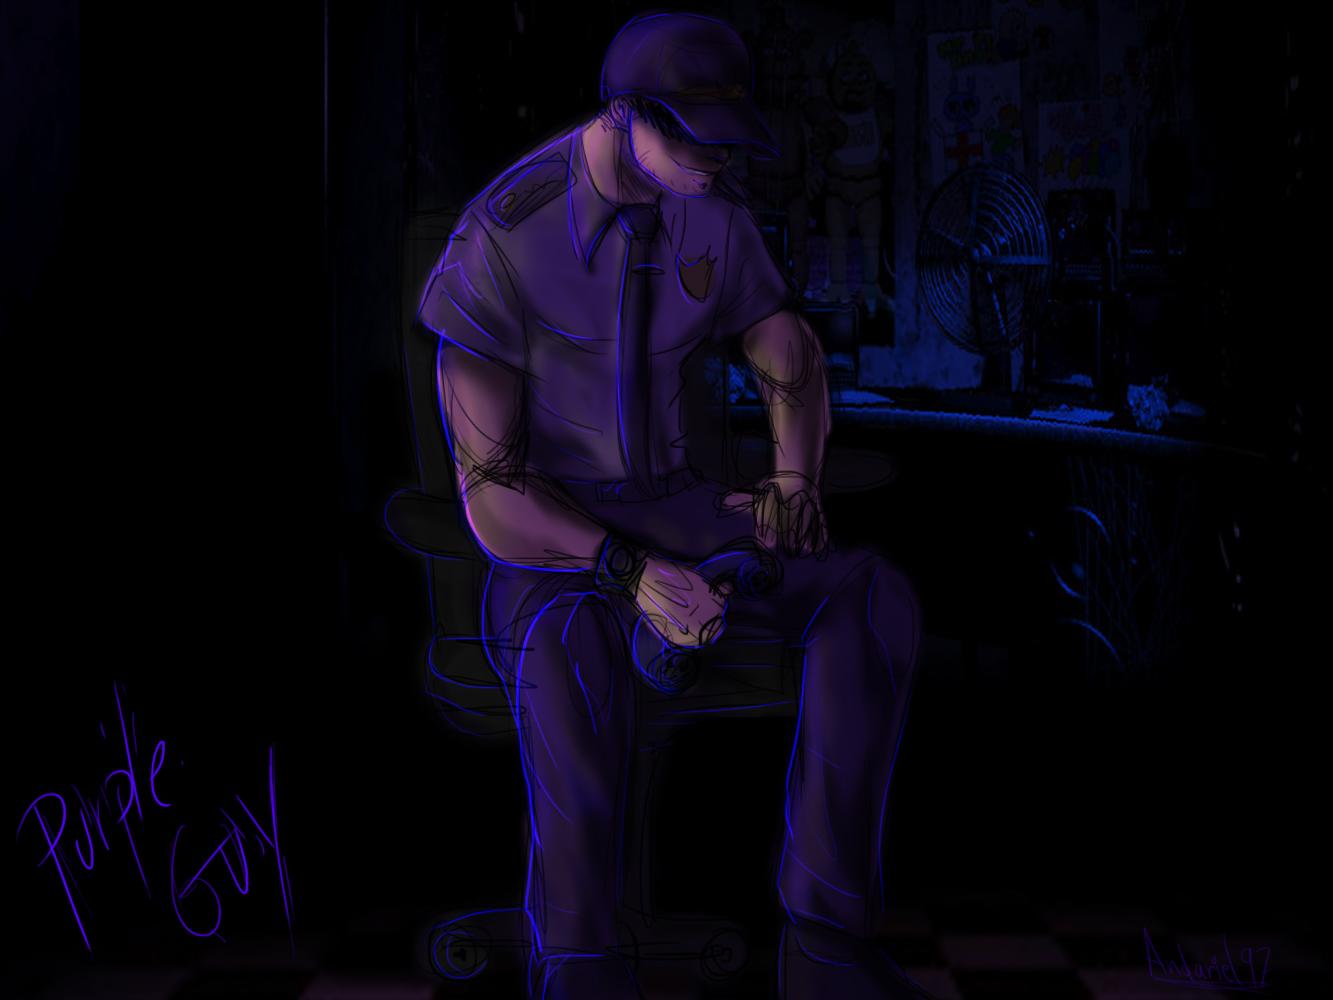 Purple Guy FNAF By Andariel97 On DeviantArt